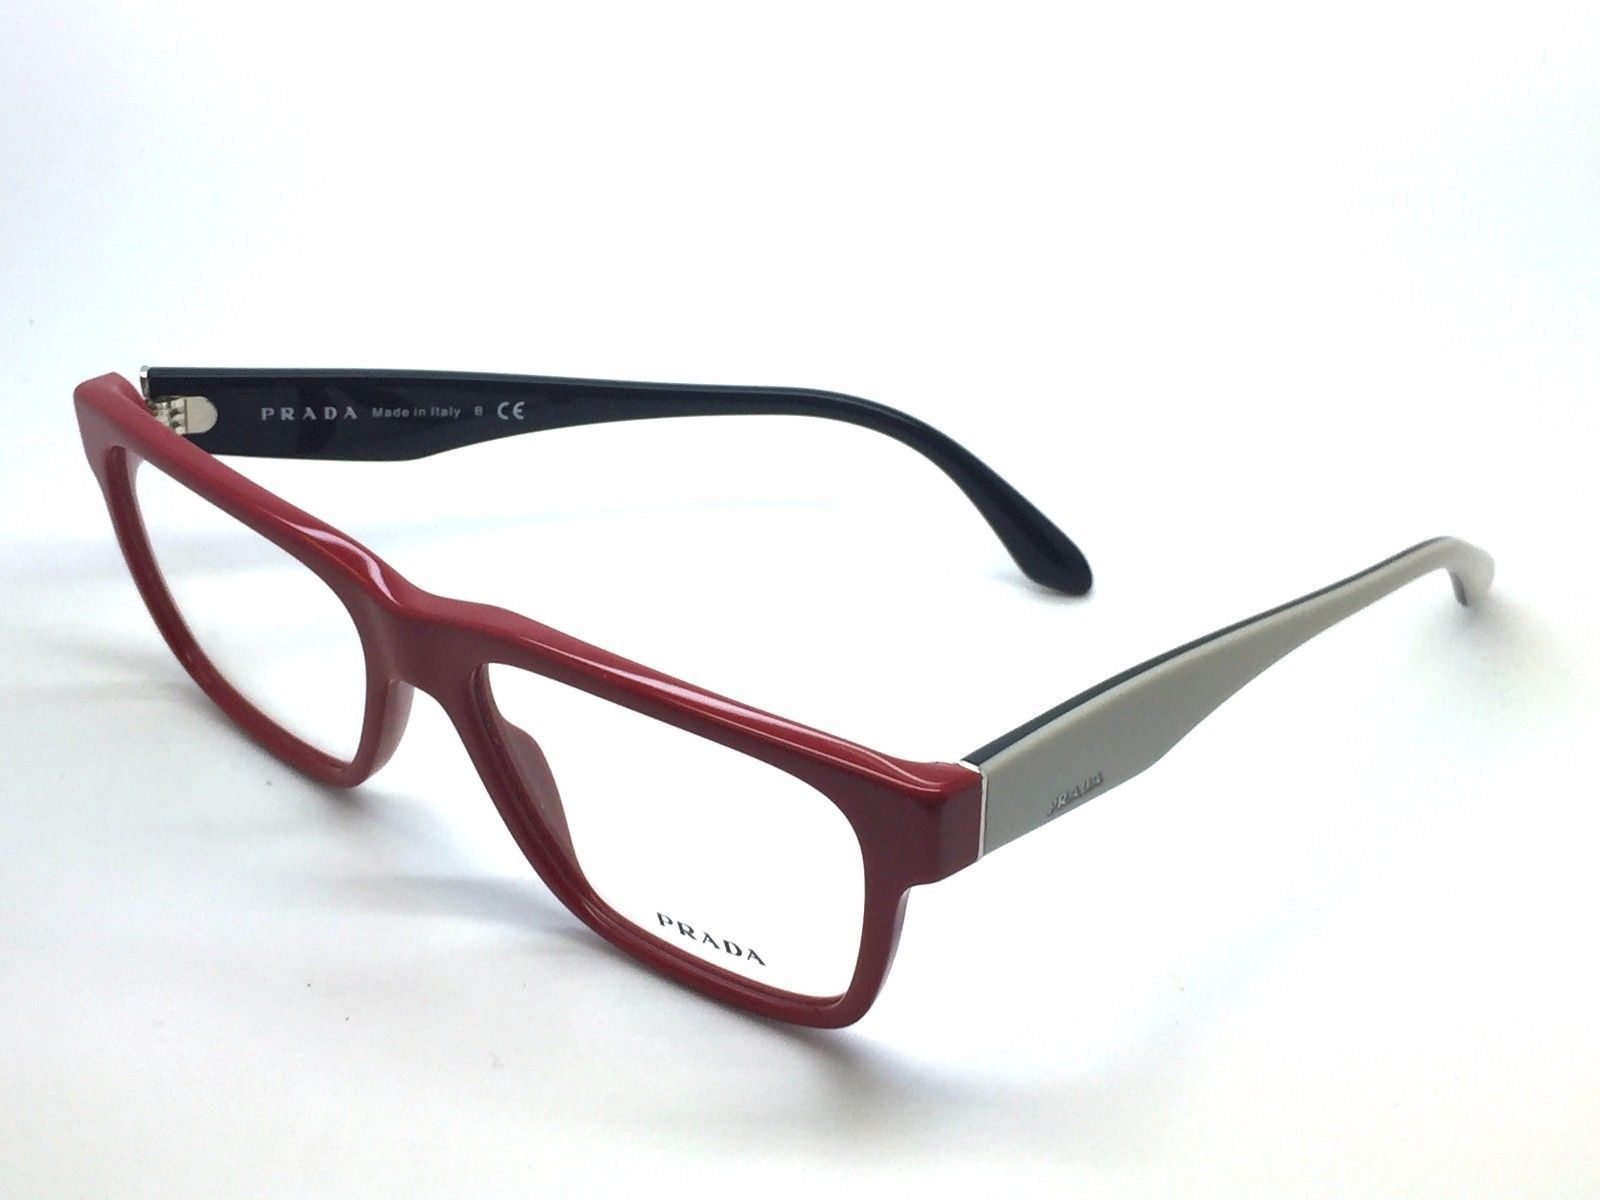 Nuevo VPR16R PR16RV TKS-1O1 Prada Rojo Beige Auténtico Gafas Marco ...